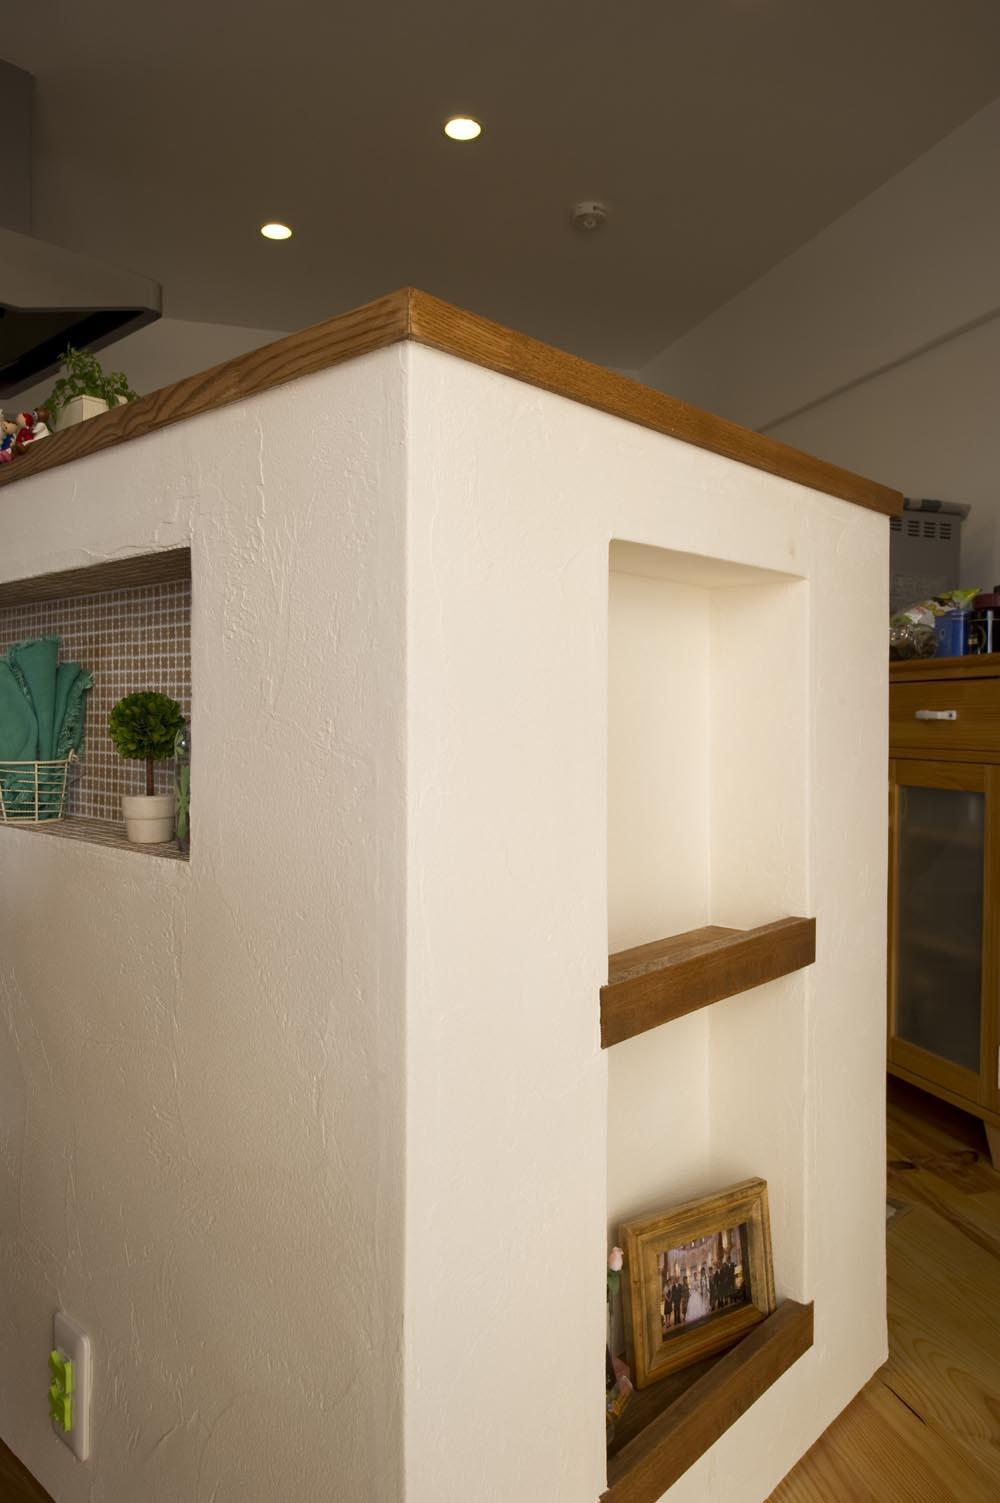 I邸・斜めに配置したキッチンで、動きと変化を (カウンターキッチン横のニッチ)